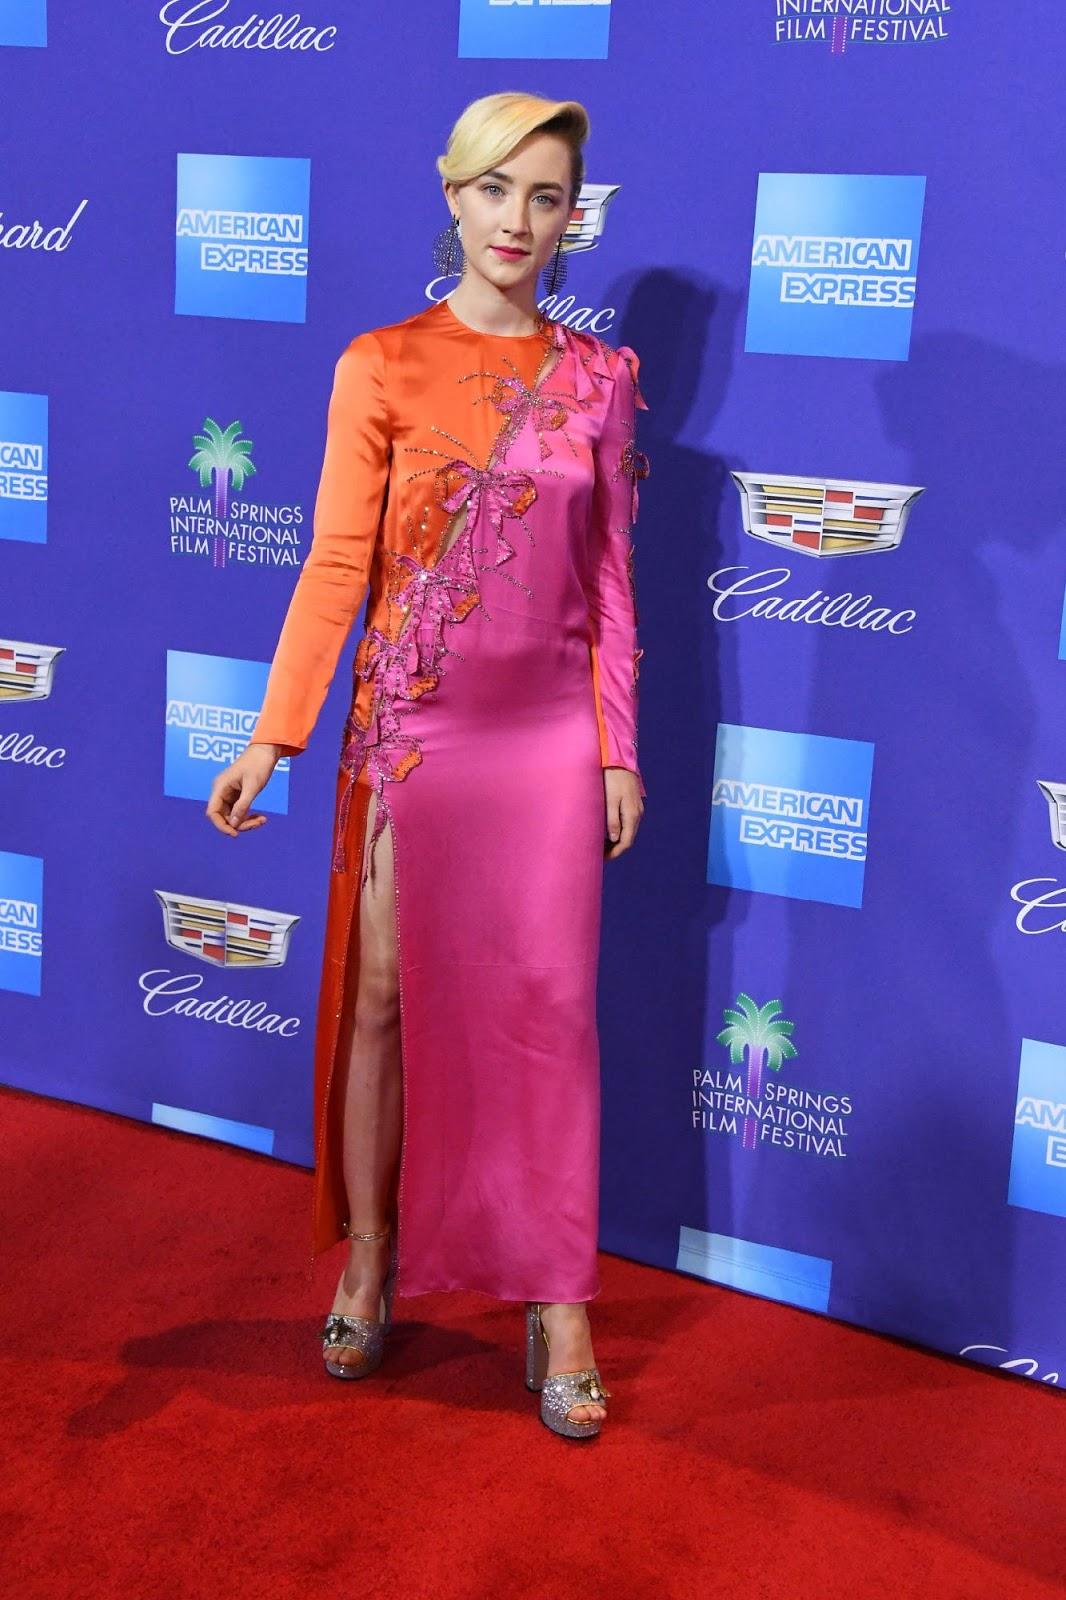 Saoirse Ronan Posing at 29th Annual Palm Springs International Film Festival